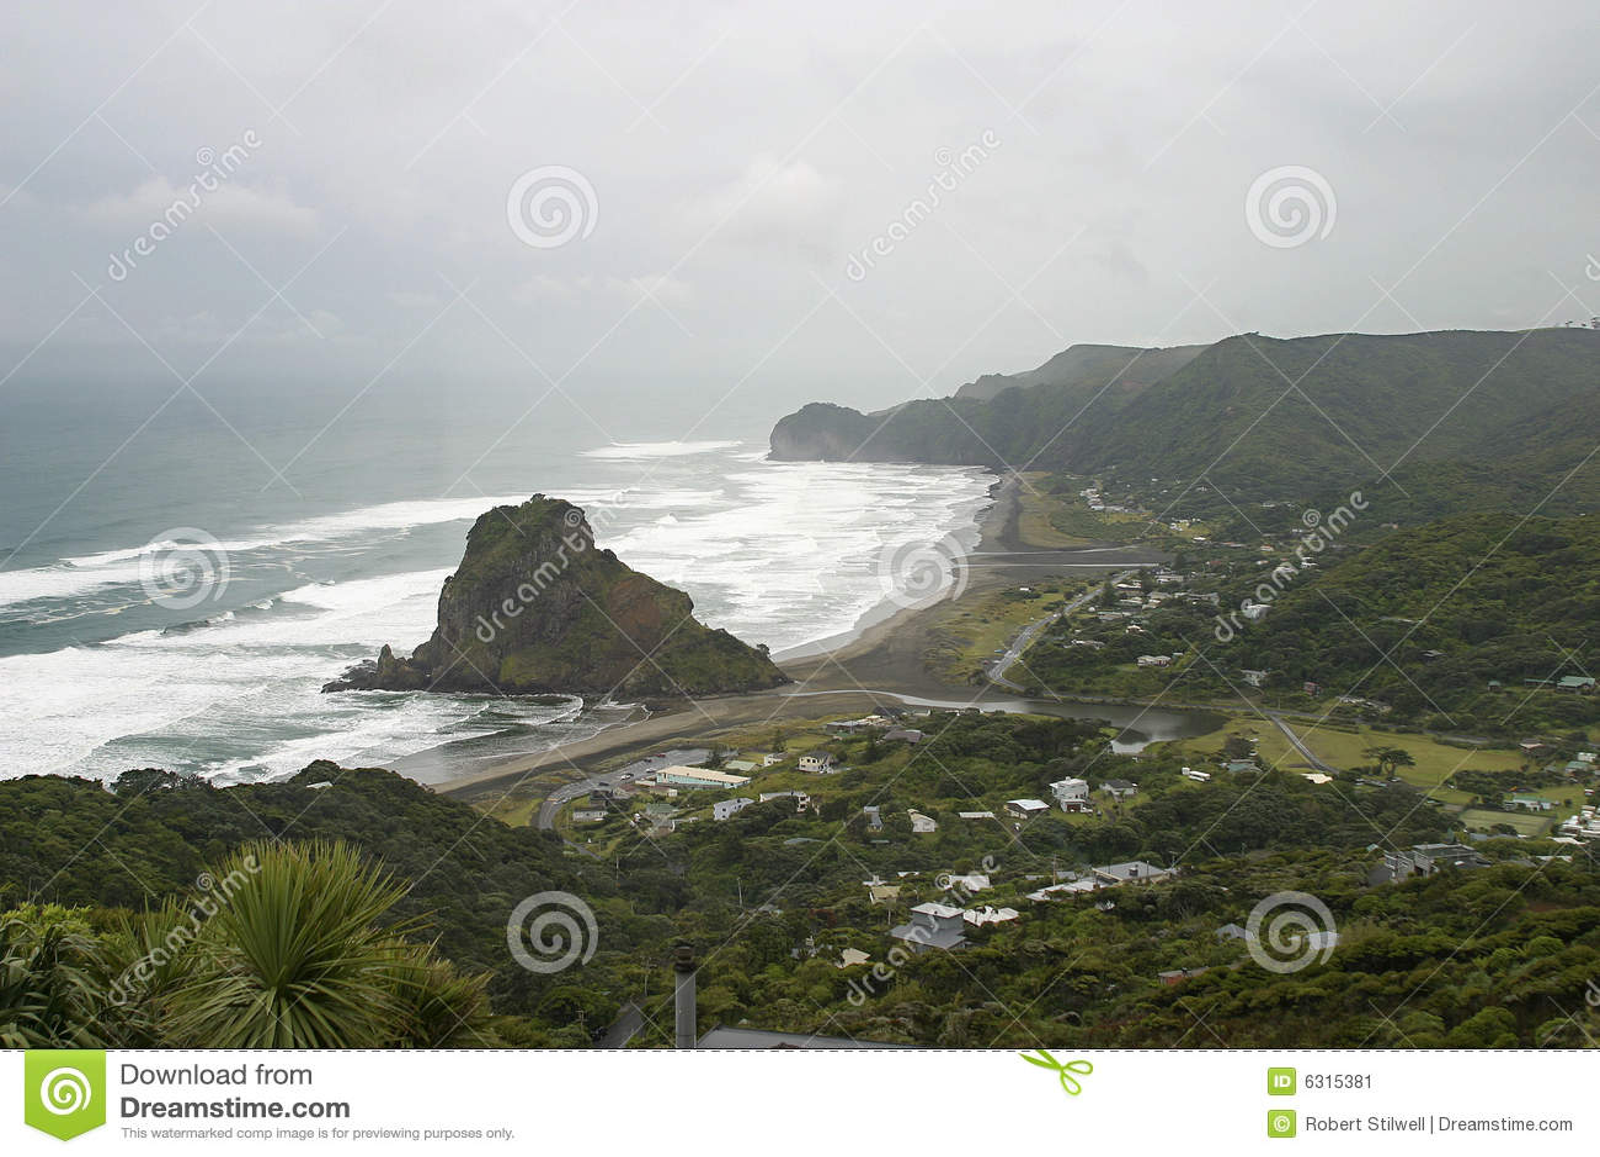 Lion Rock at Piha, New Zealand